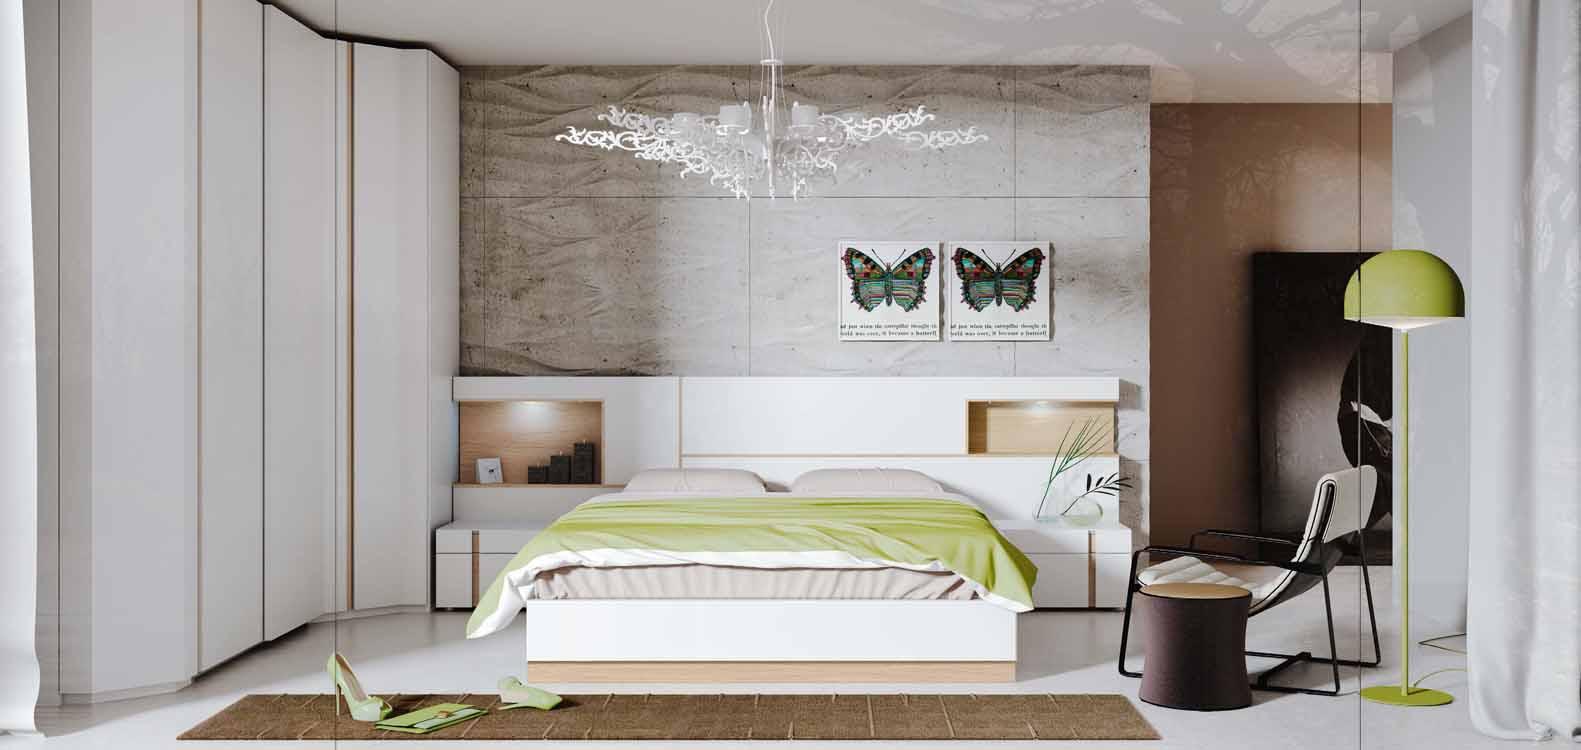 Muebles mu oz dormitorios actuales catalogo 4 for Catalogo habitaciones matrimonio